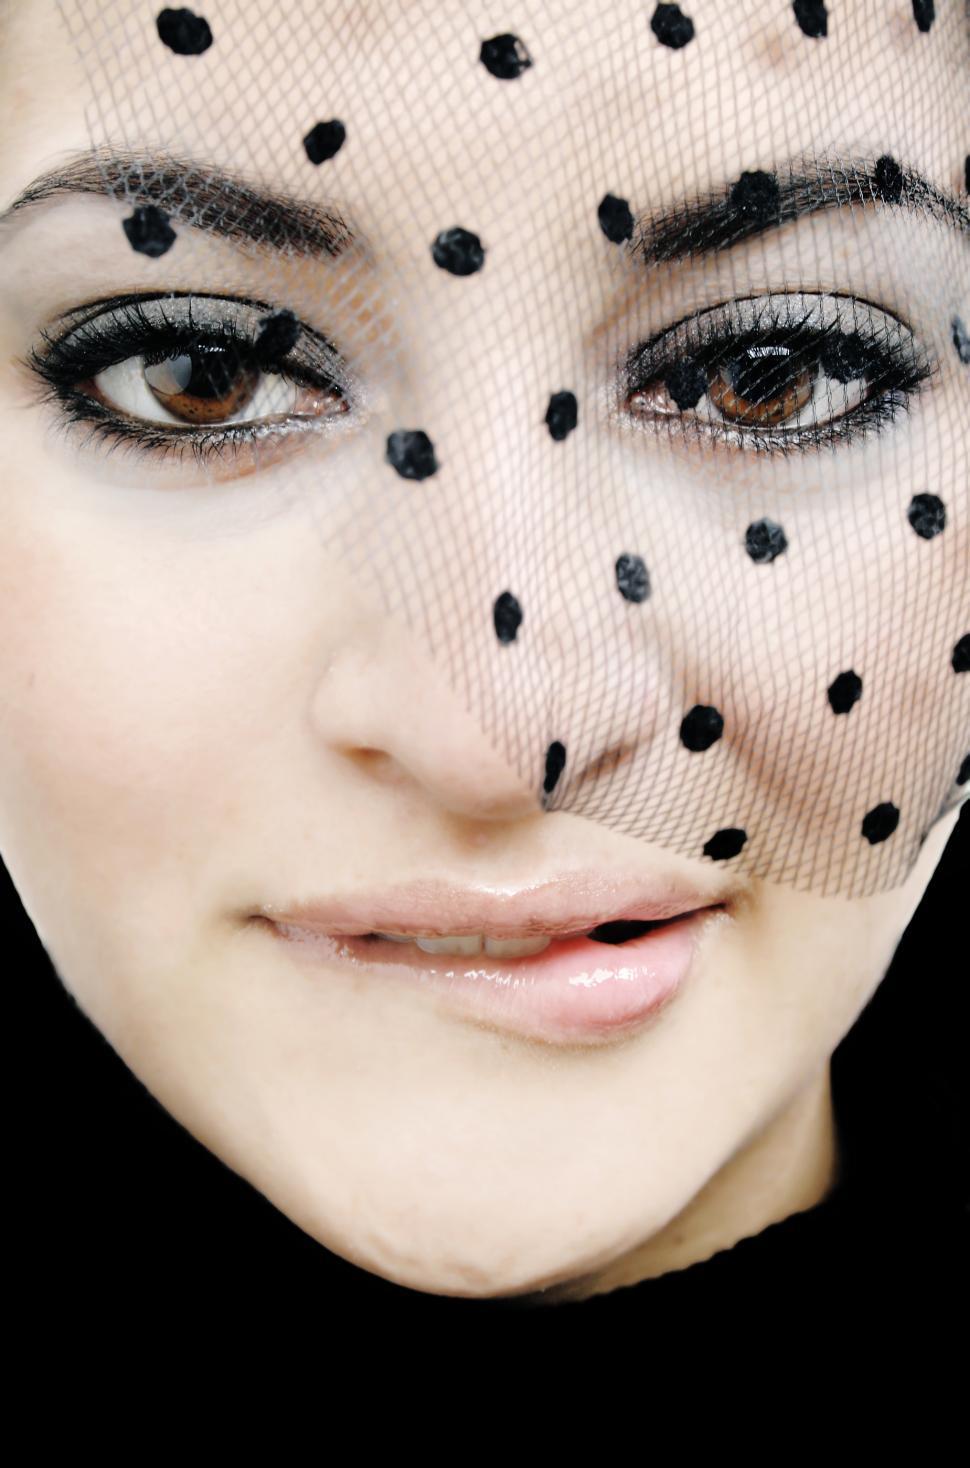 Download Free Stock HD Photo of beauty portrait woman Online